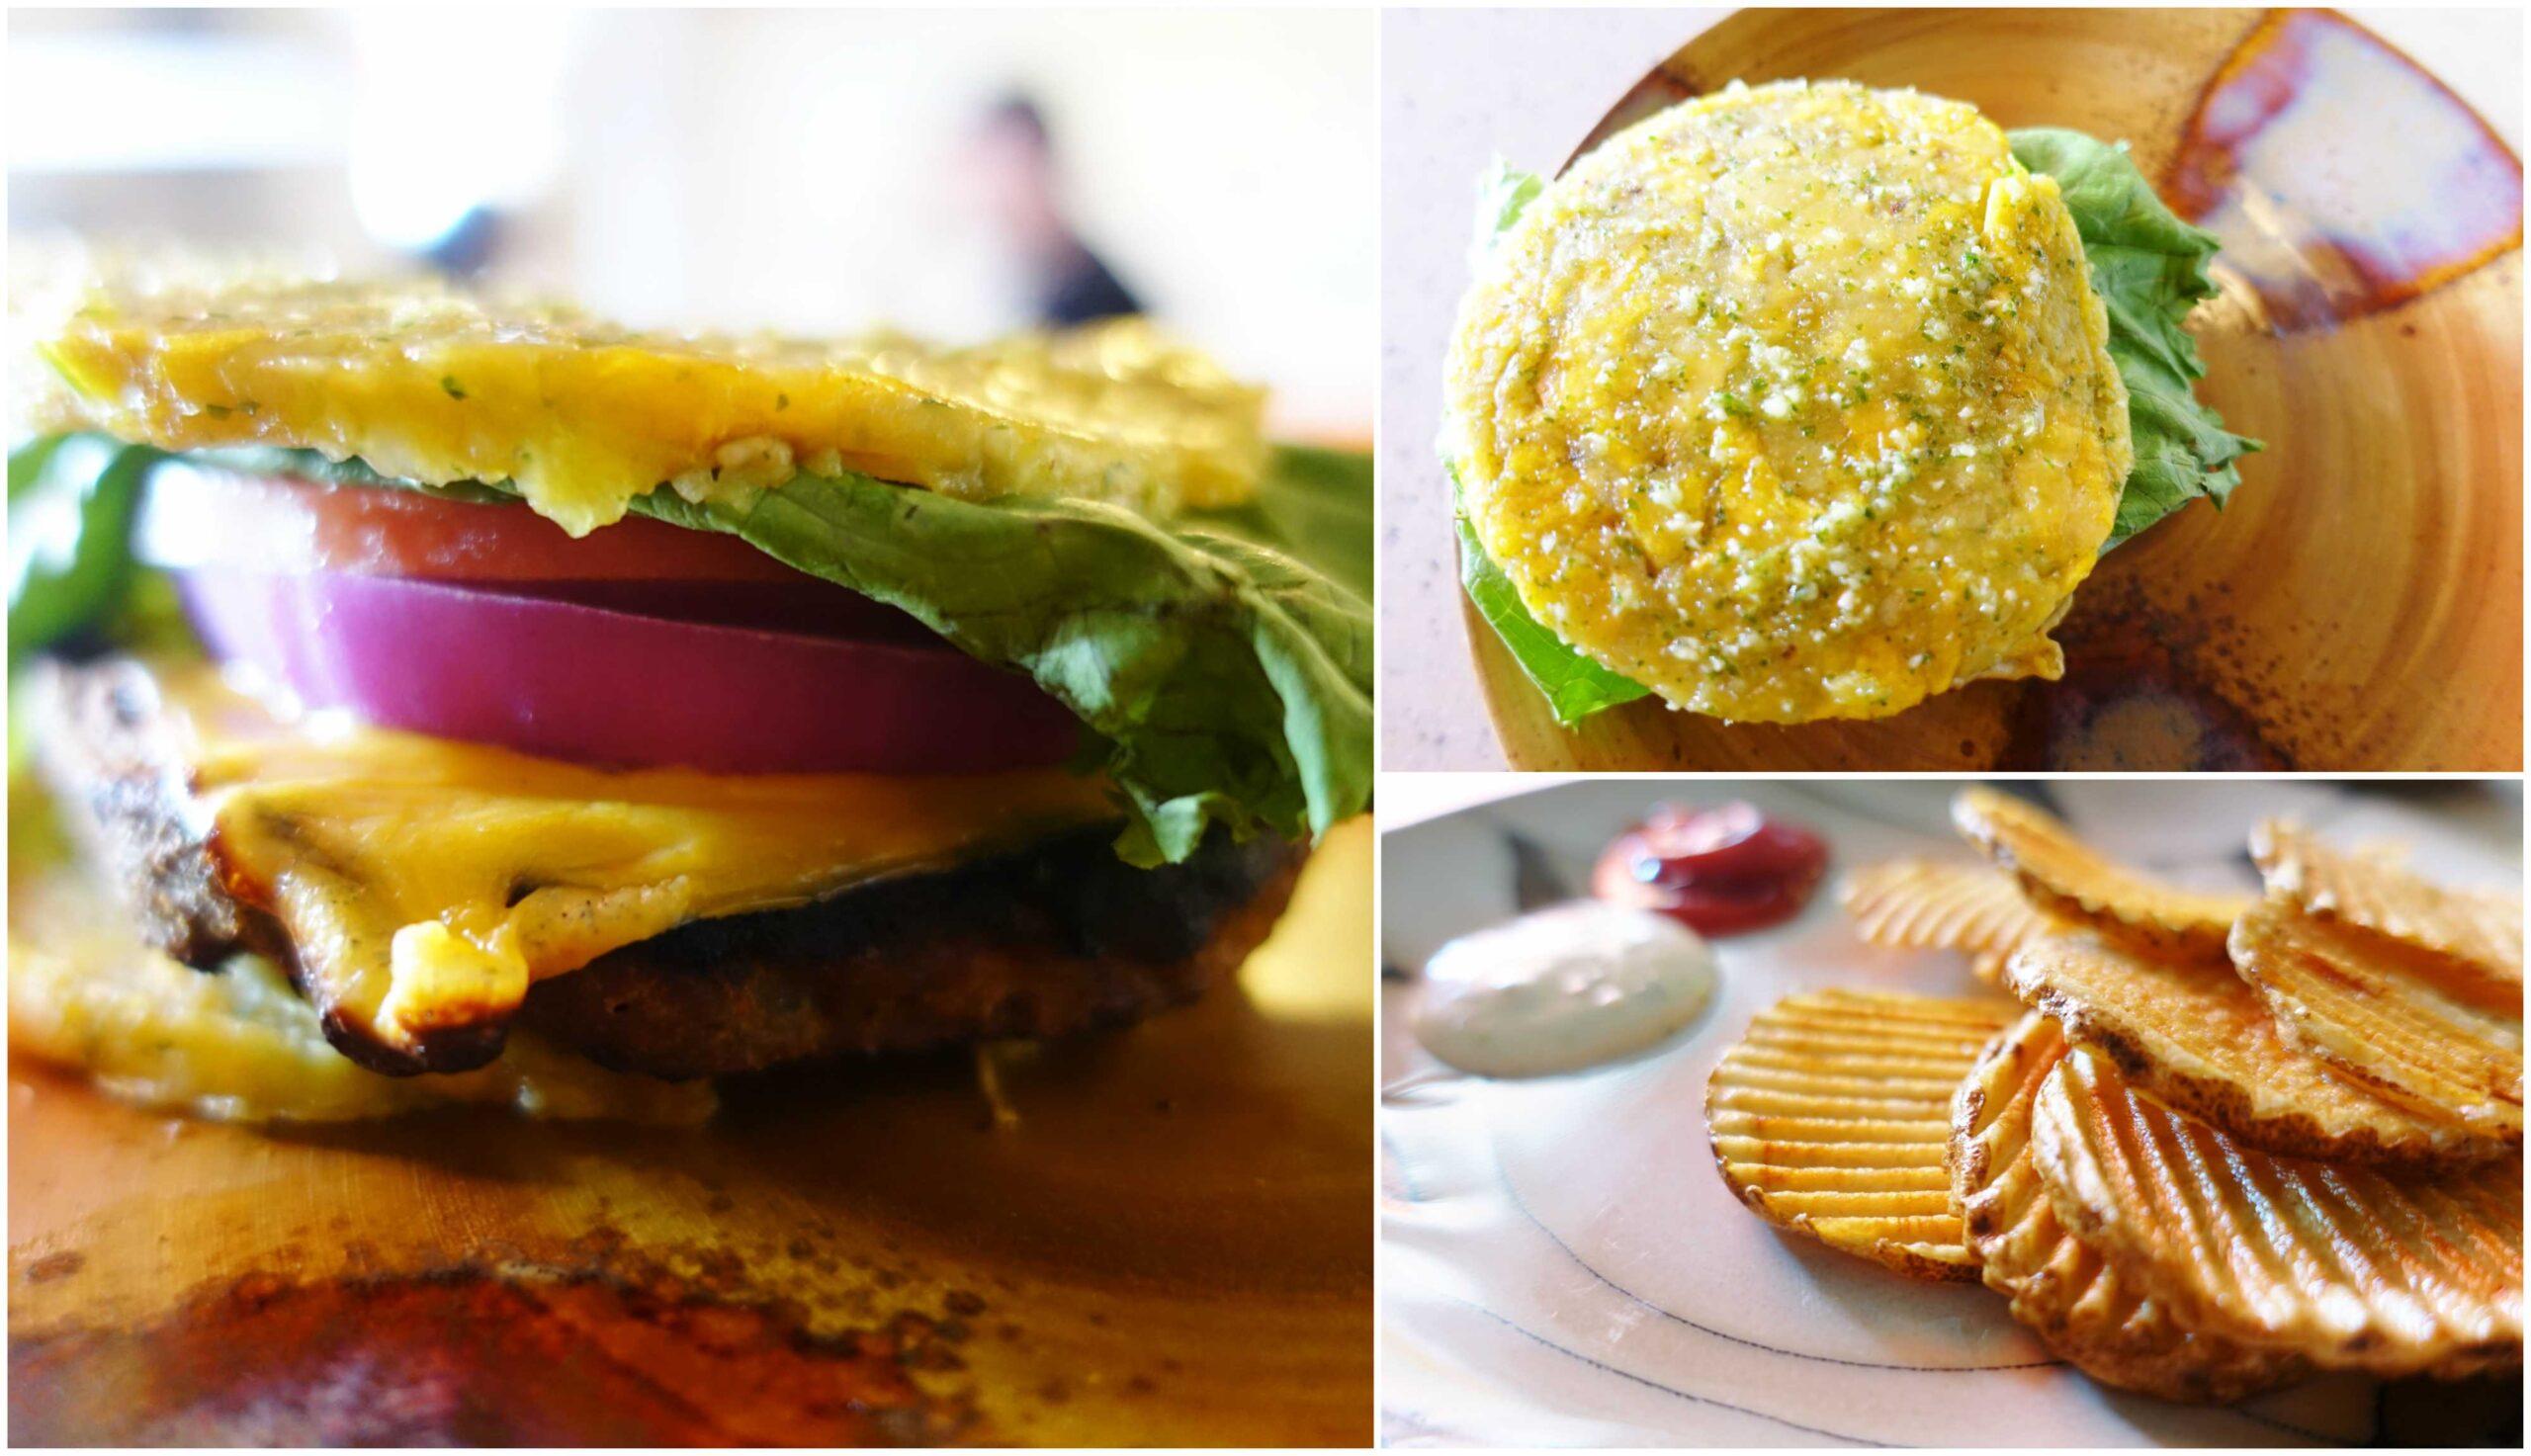 Sweet Potato Vegetables Veggie Burger - Mi Vida Cafe & Burger, Rio Grande, Puerto Rico